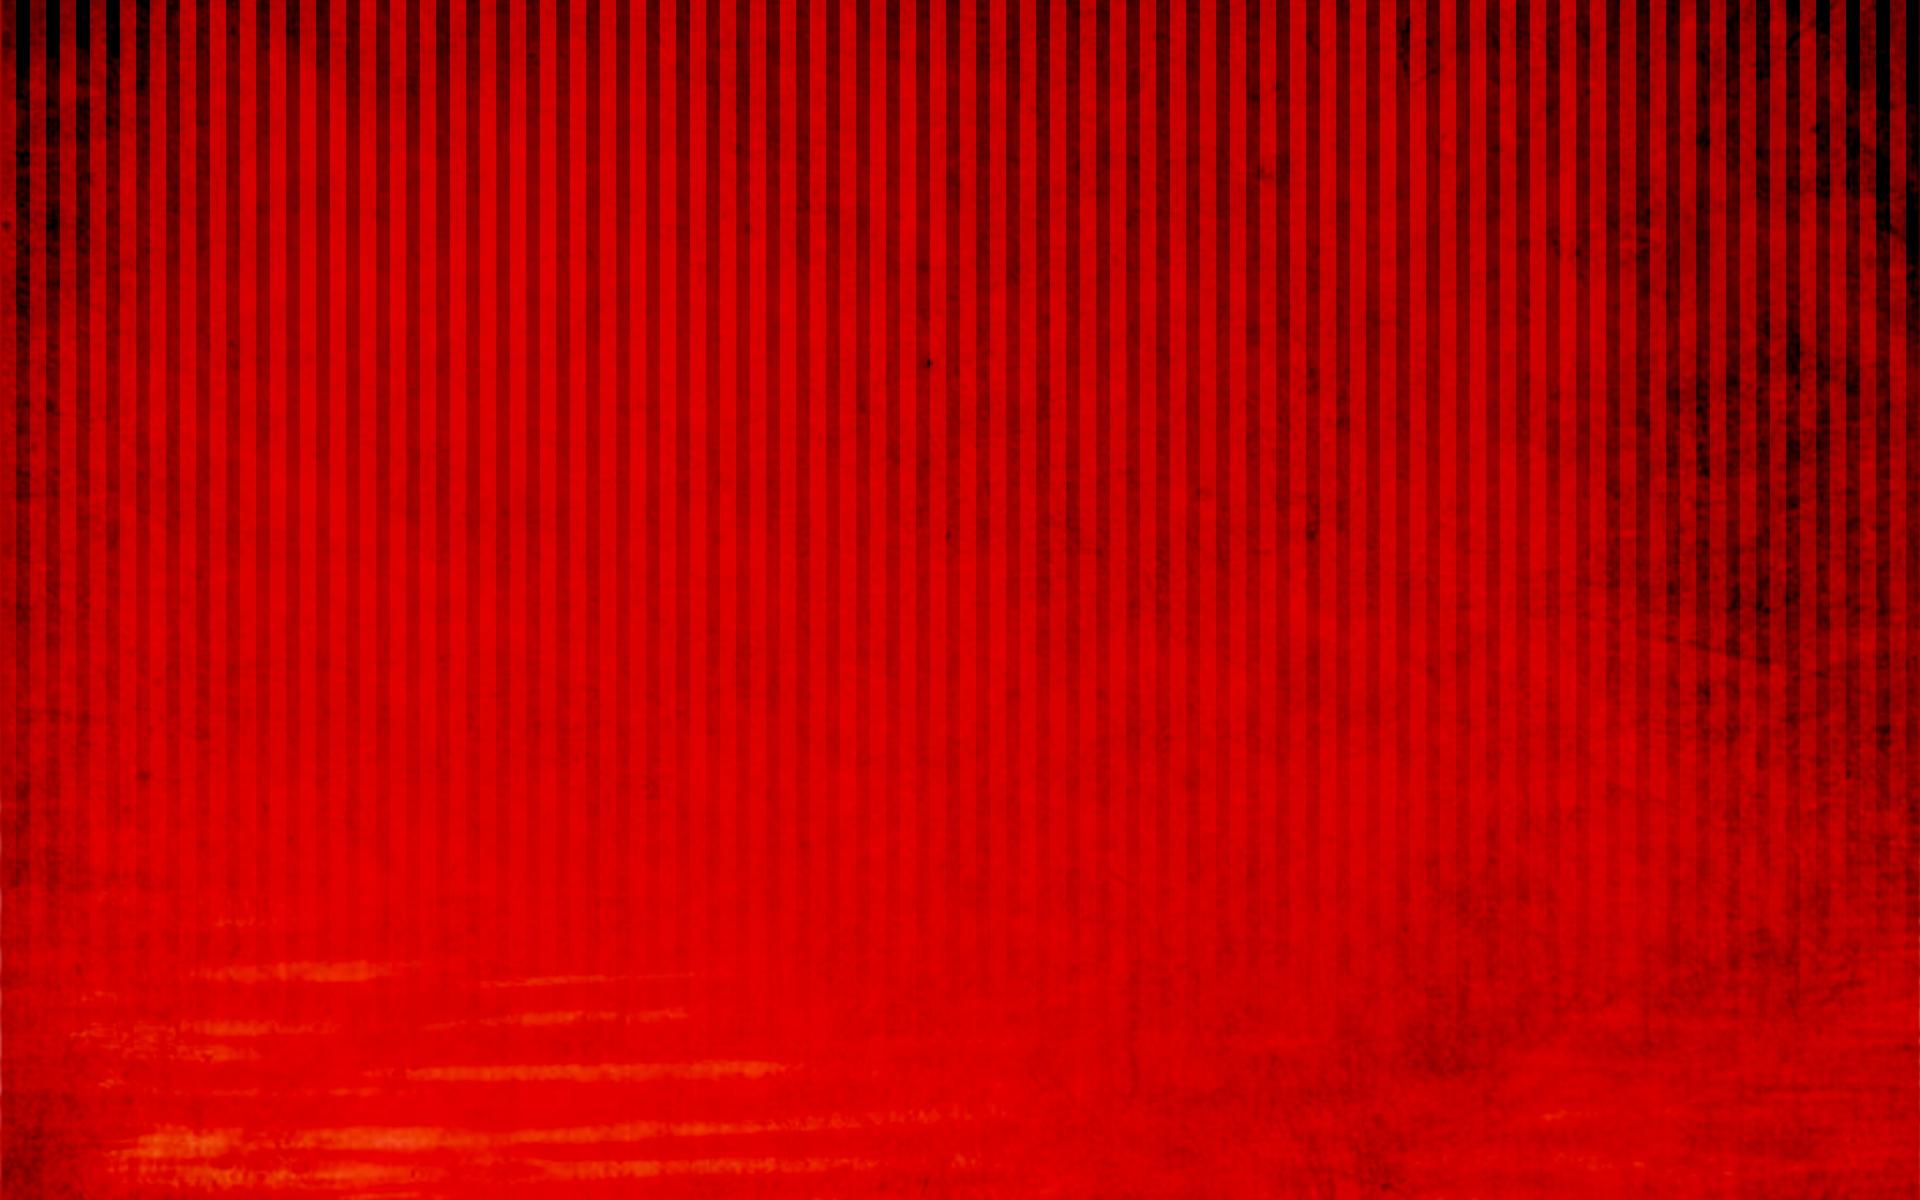 Plain Black Wallpaper For Walls Red Wallpaper 1920x1200 44517